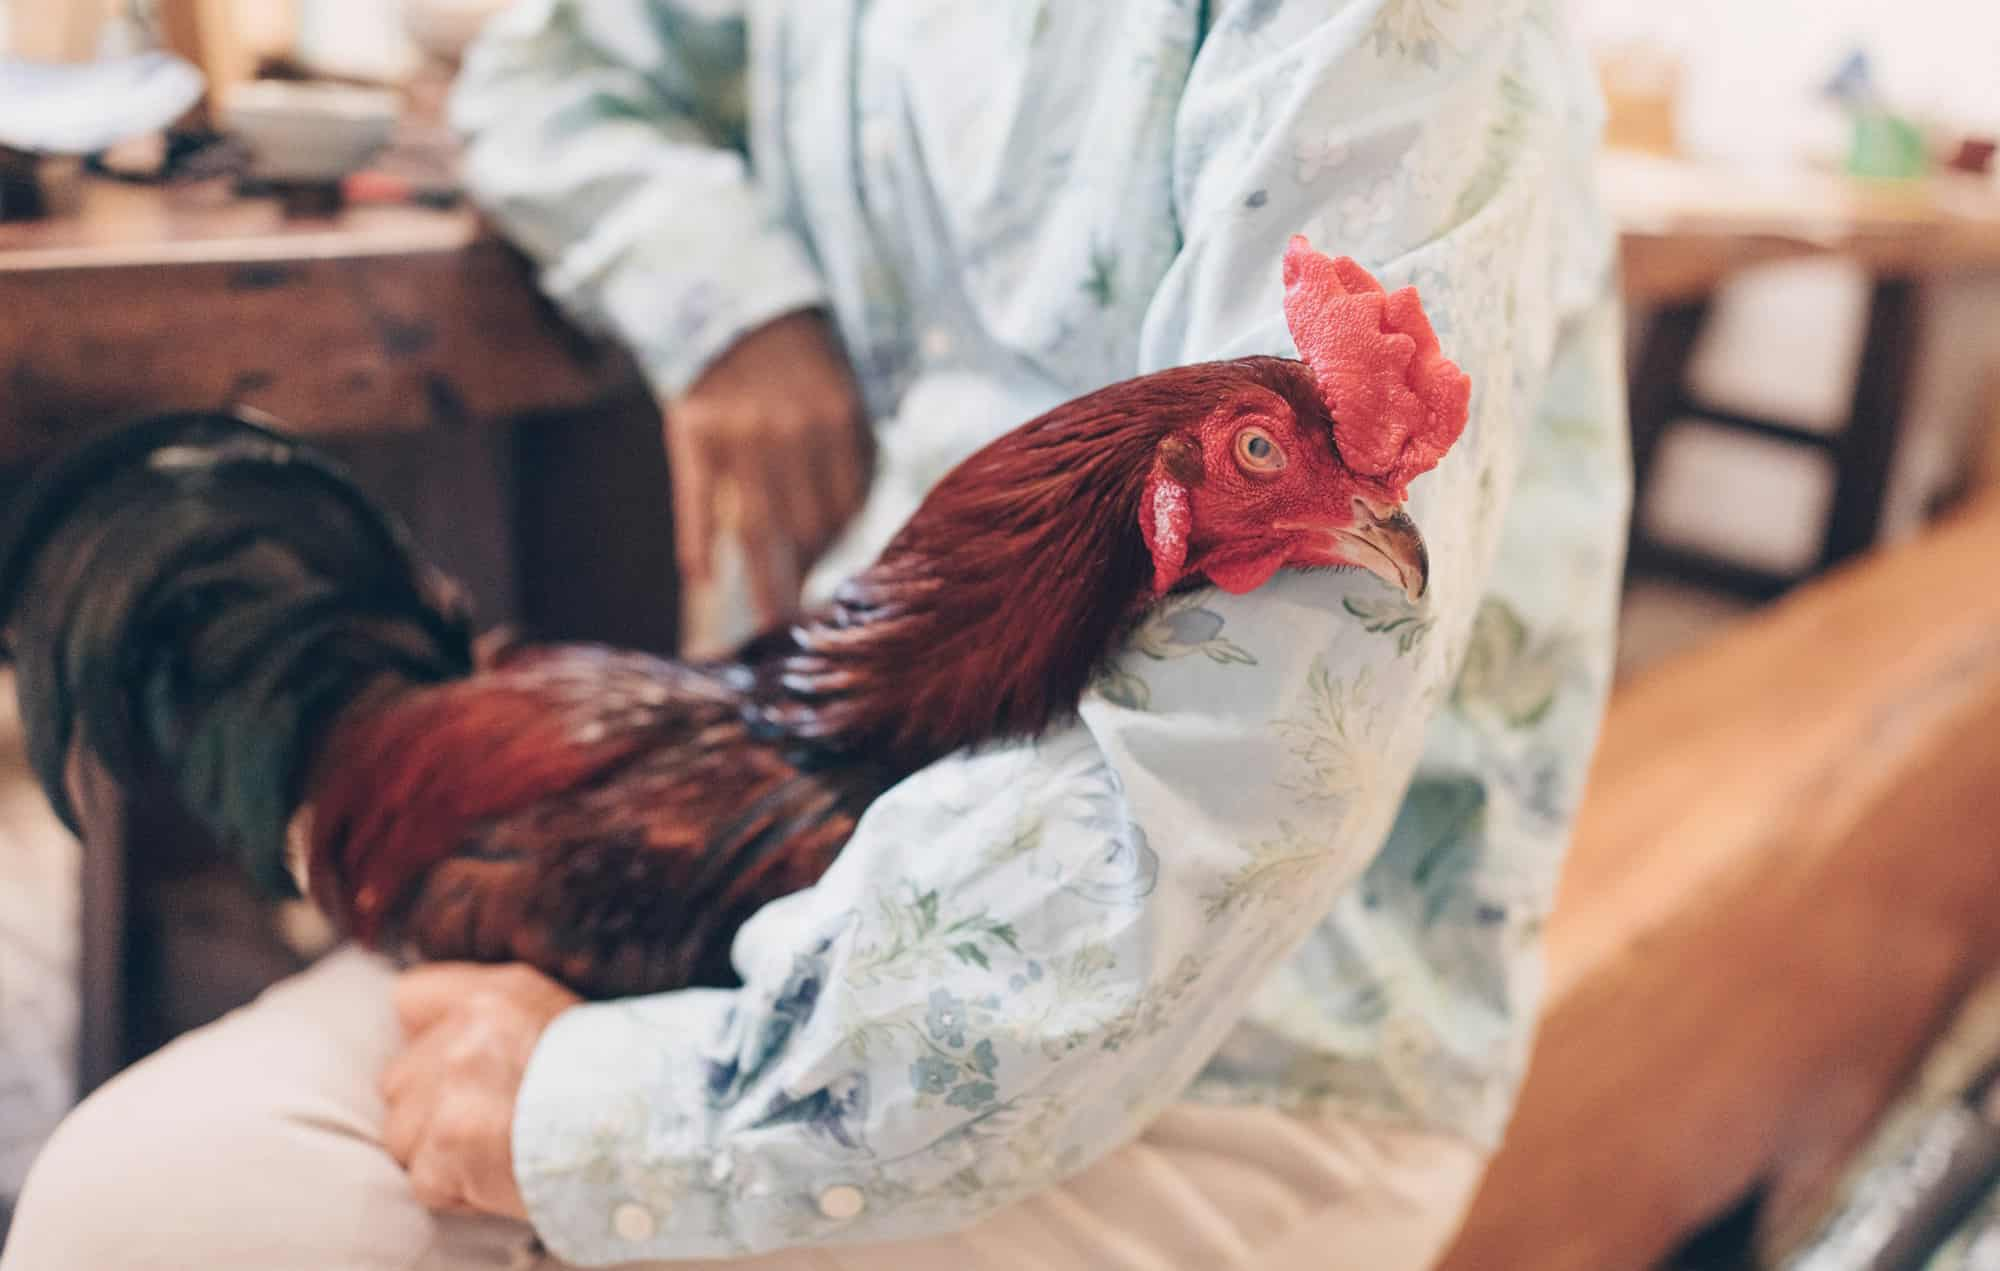 chickens avian flu